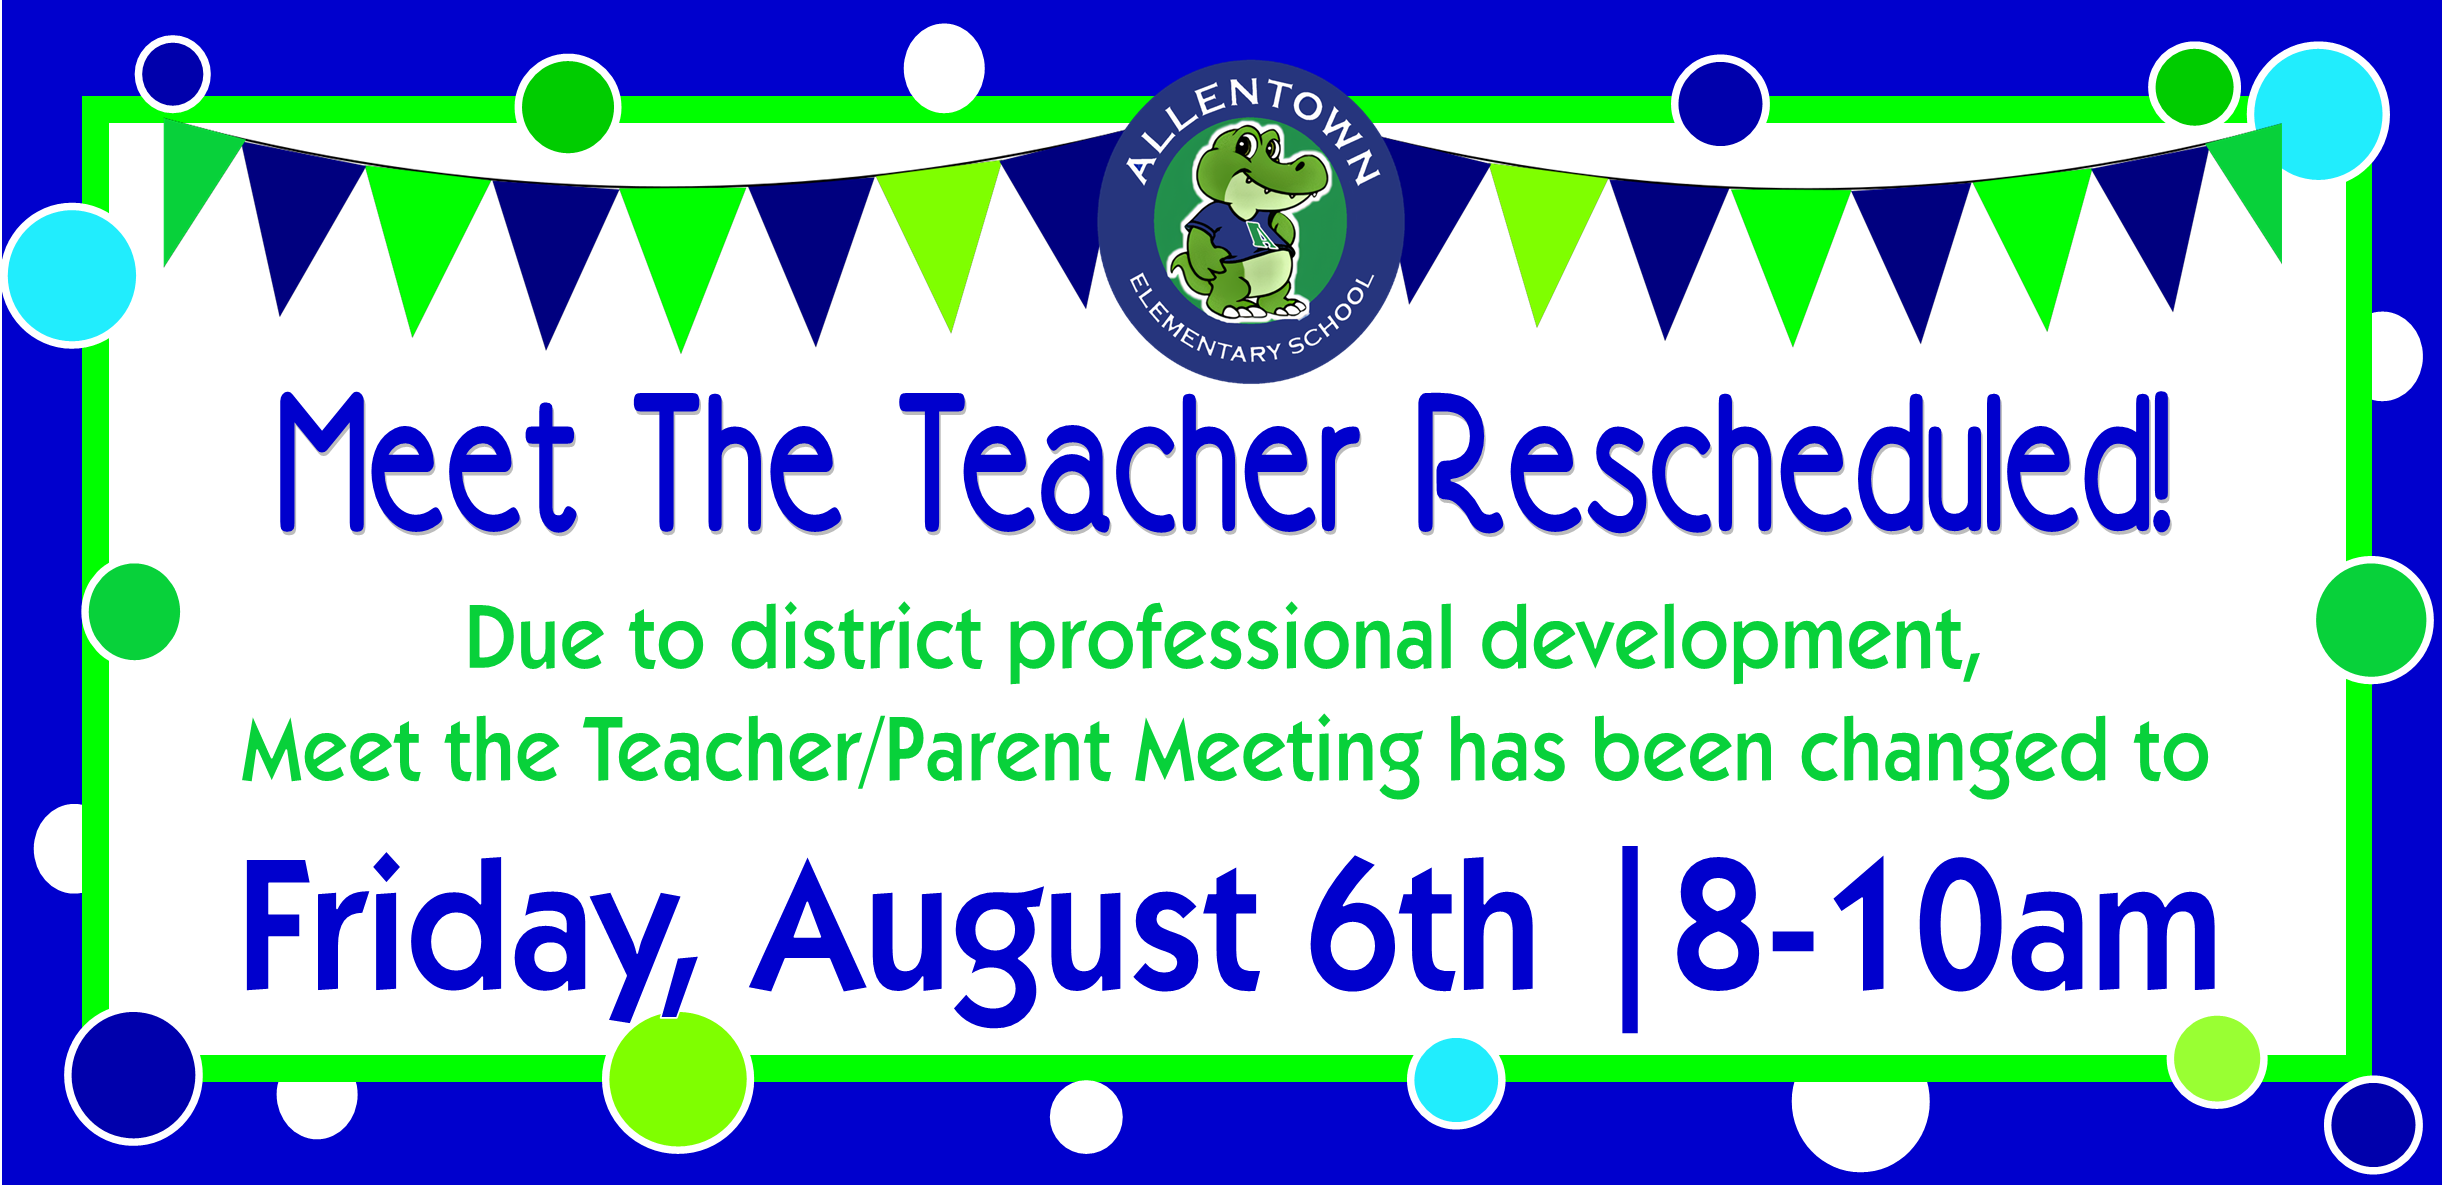 meet the teacher Aug 6th 8-10am